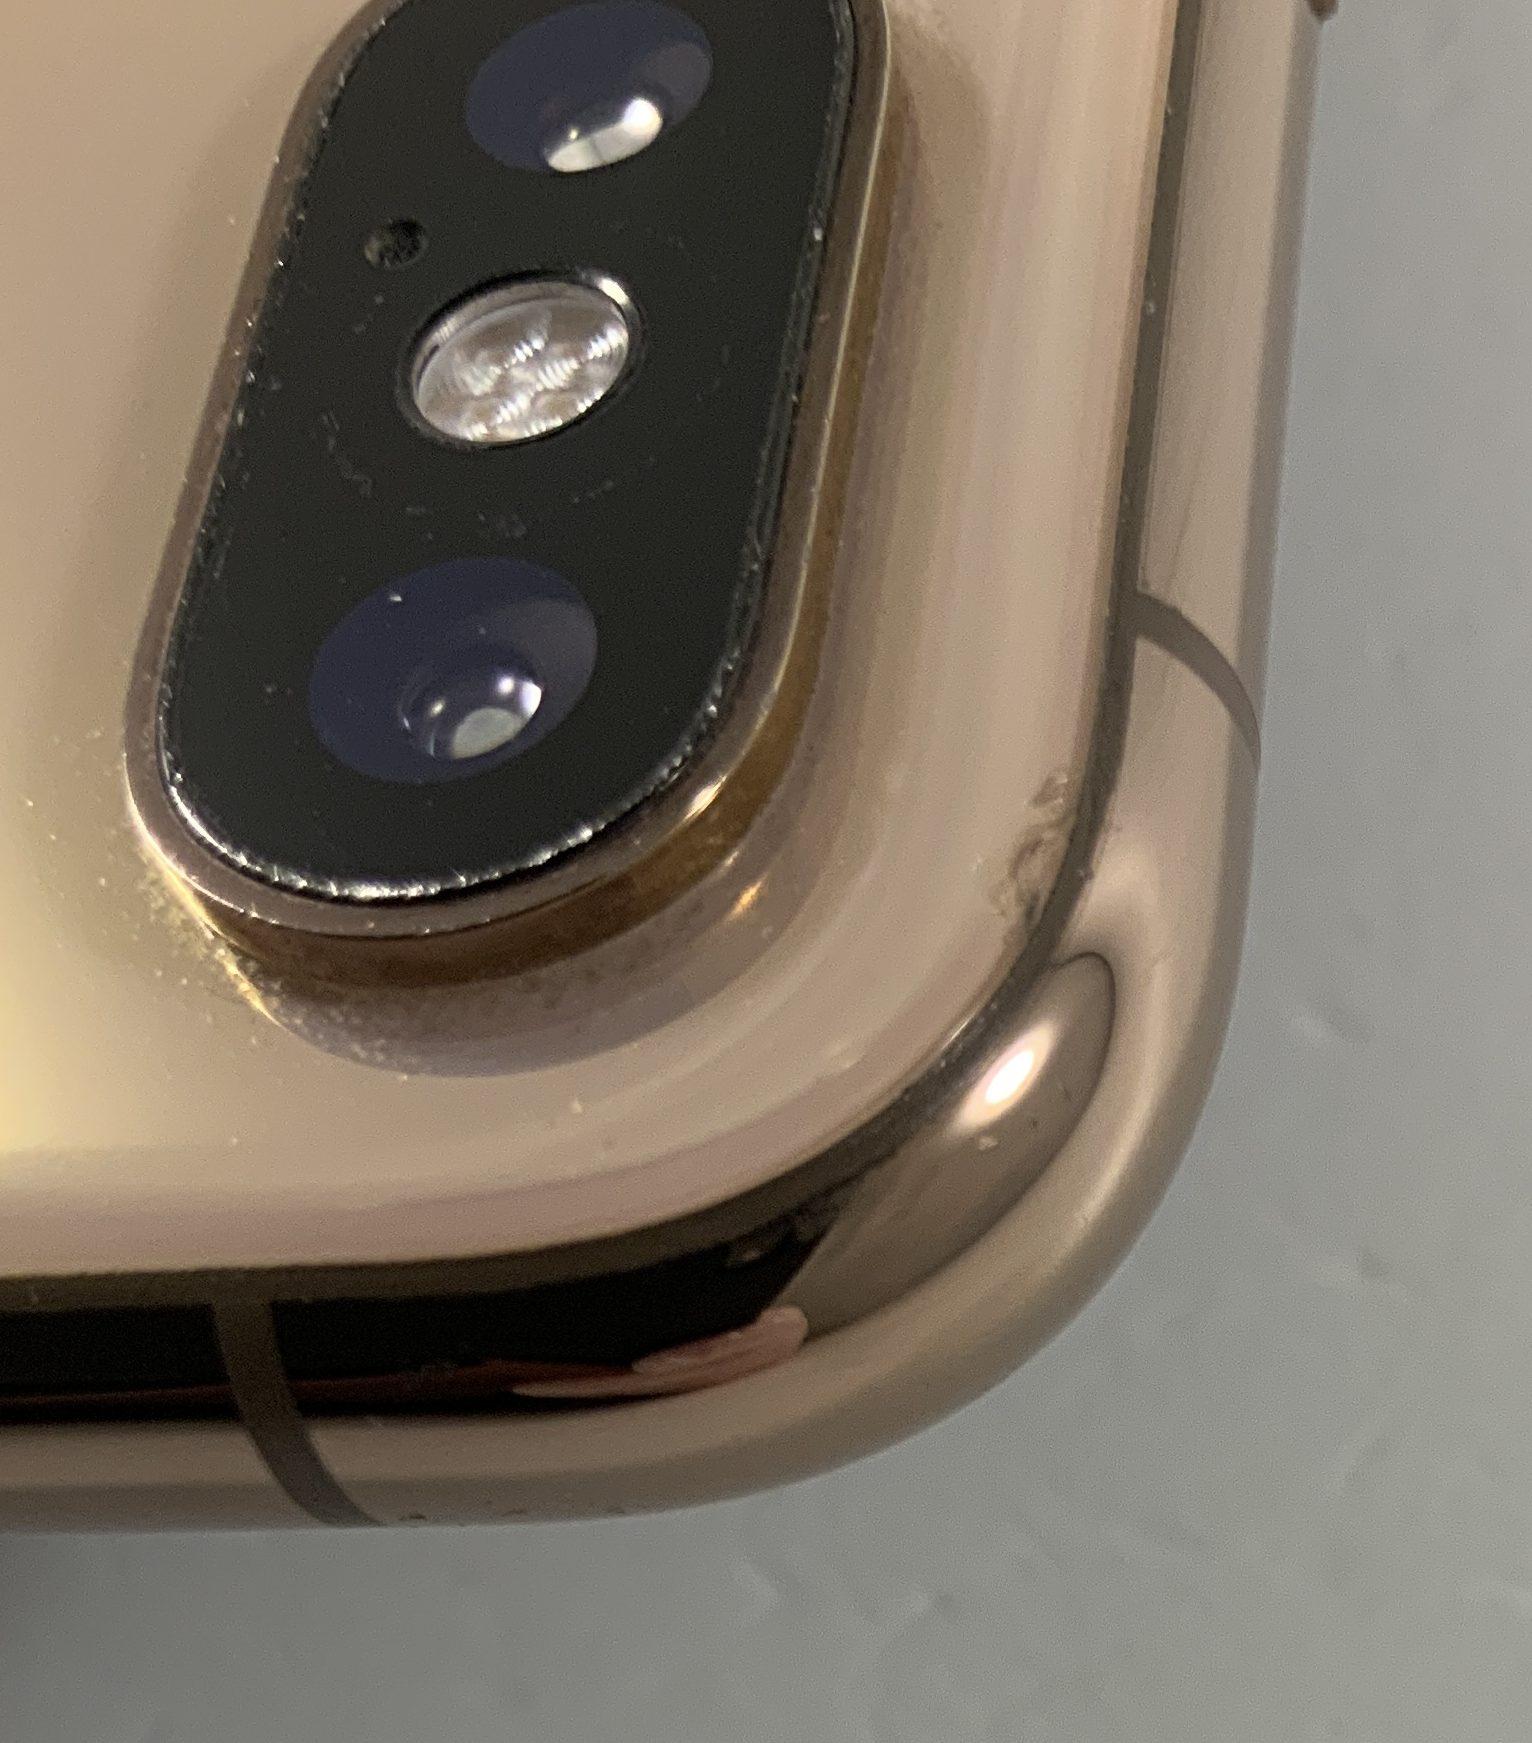 iPhone XS Max 64GB, 64GB, Gold, image 3